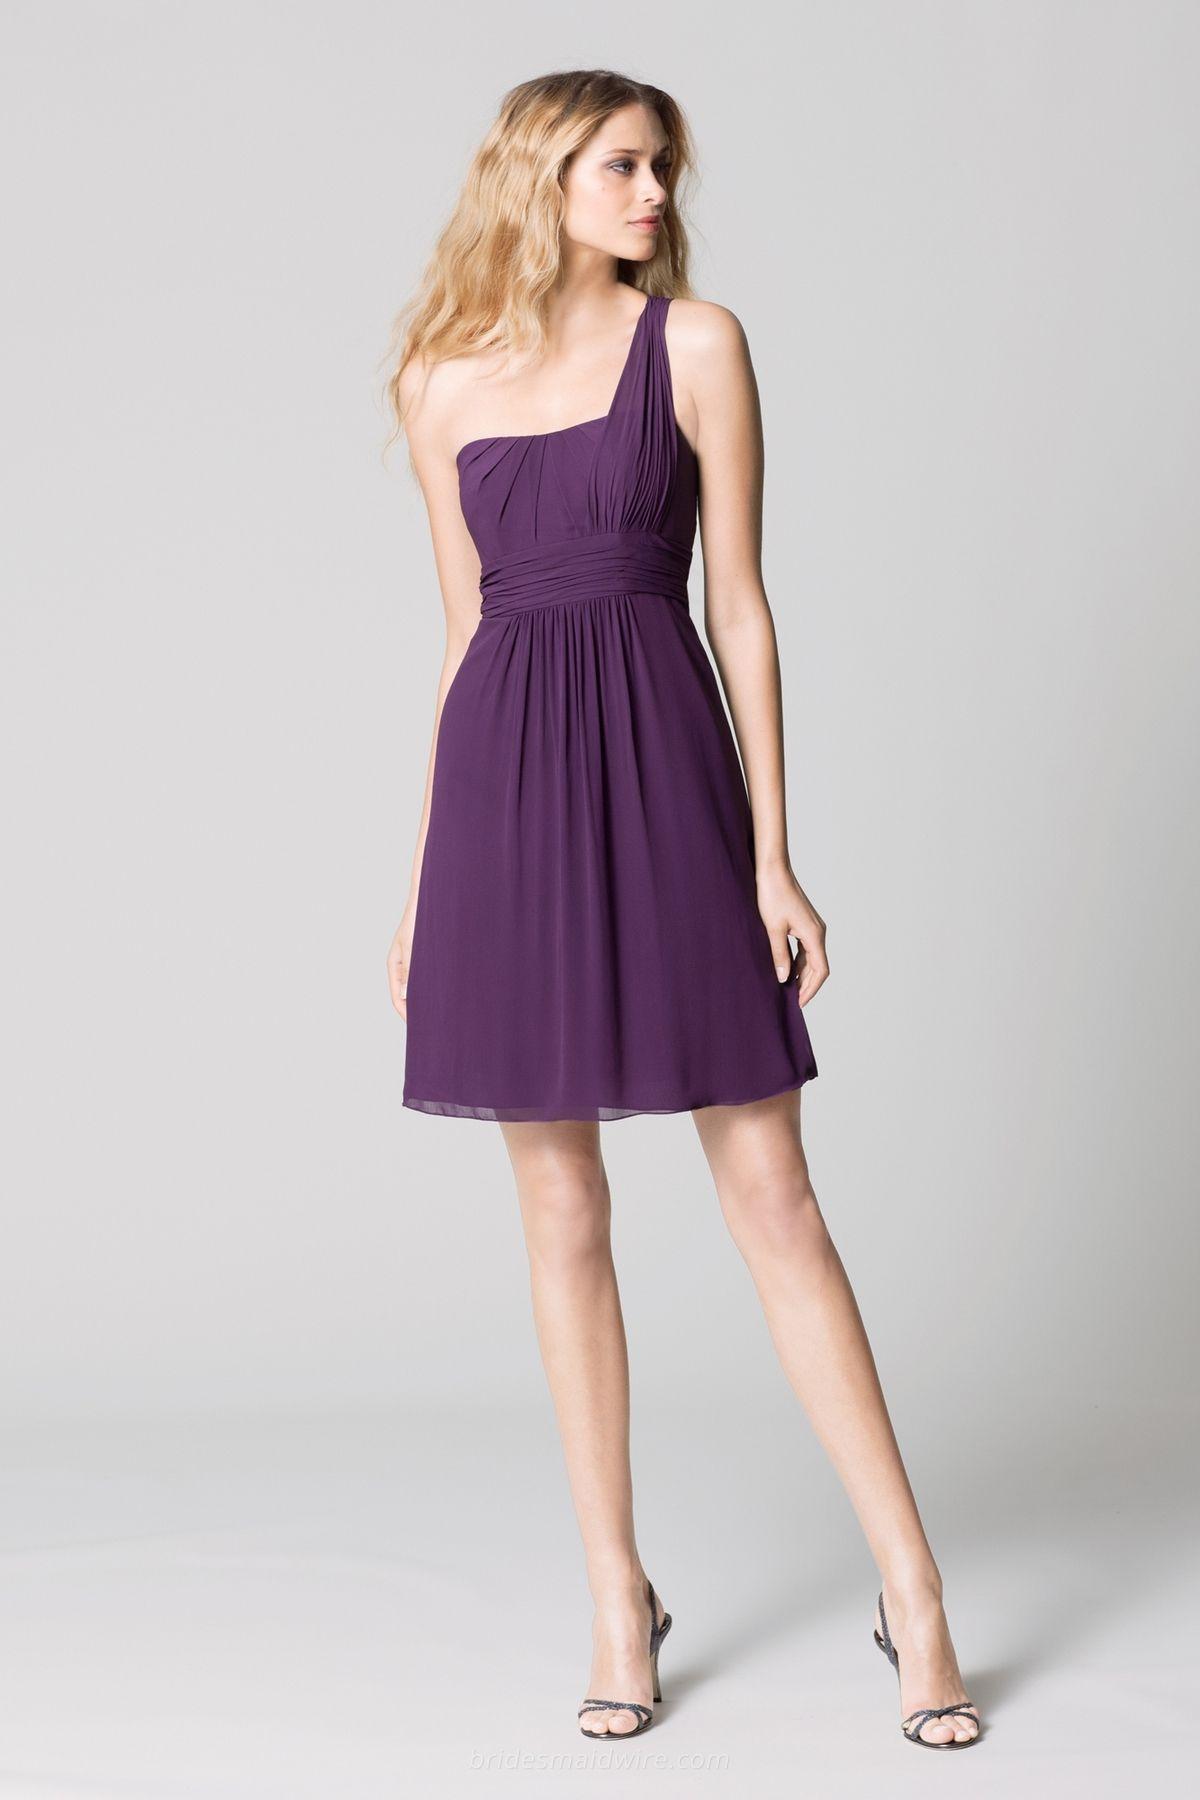 Chiffon Dark Purple Bridesmaid Dresses Knee Length